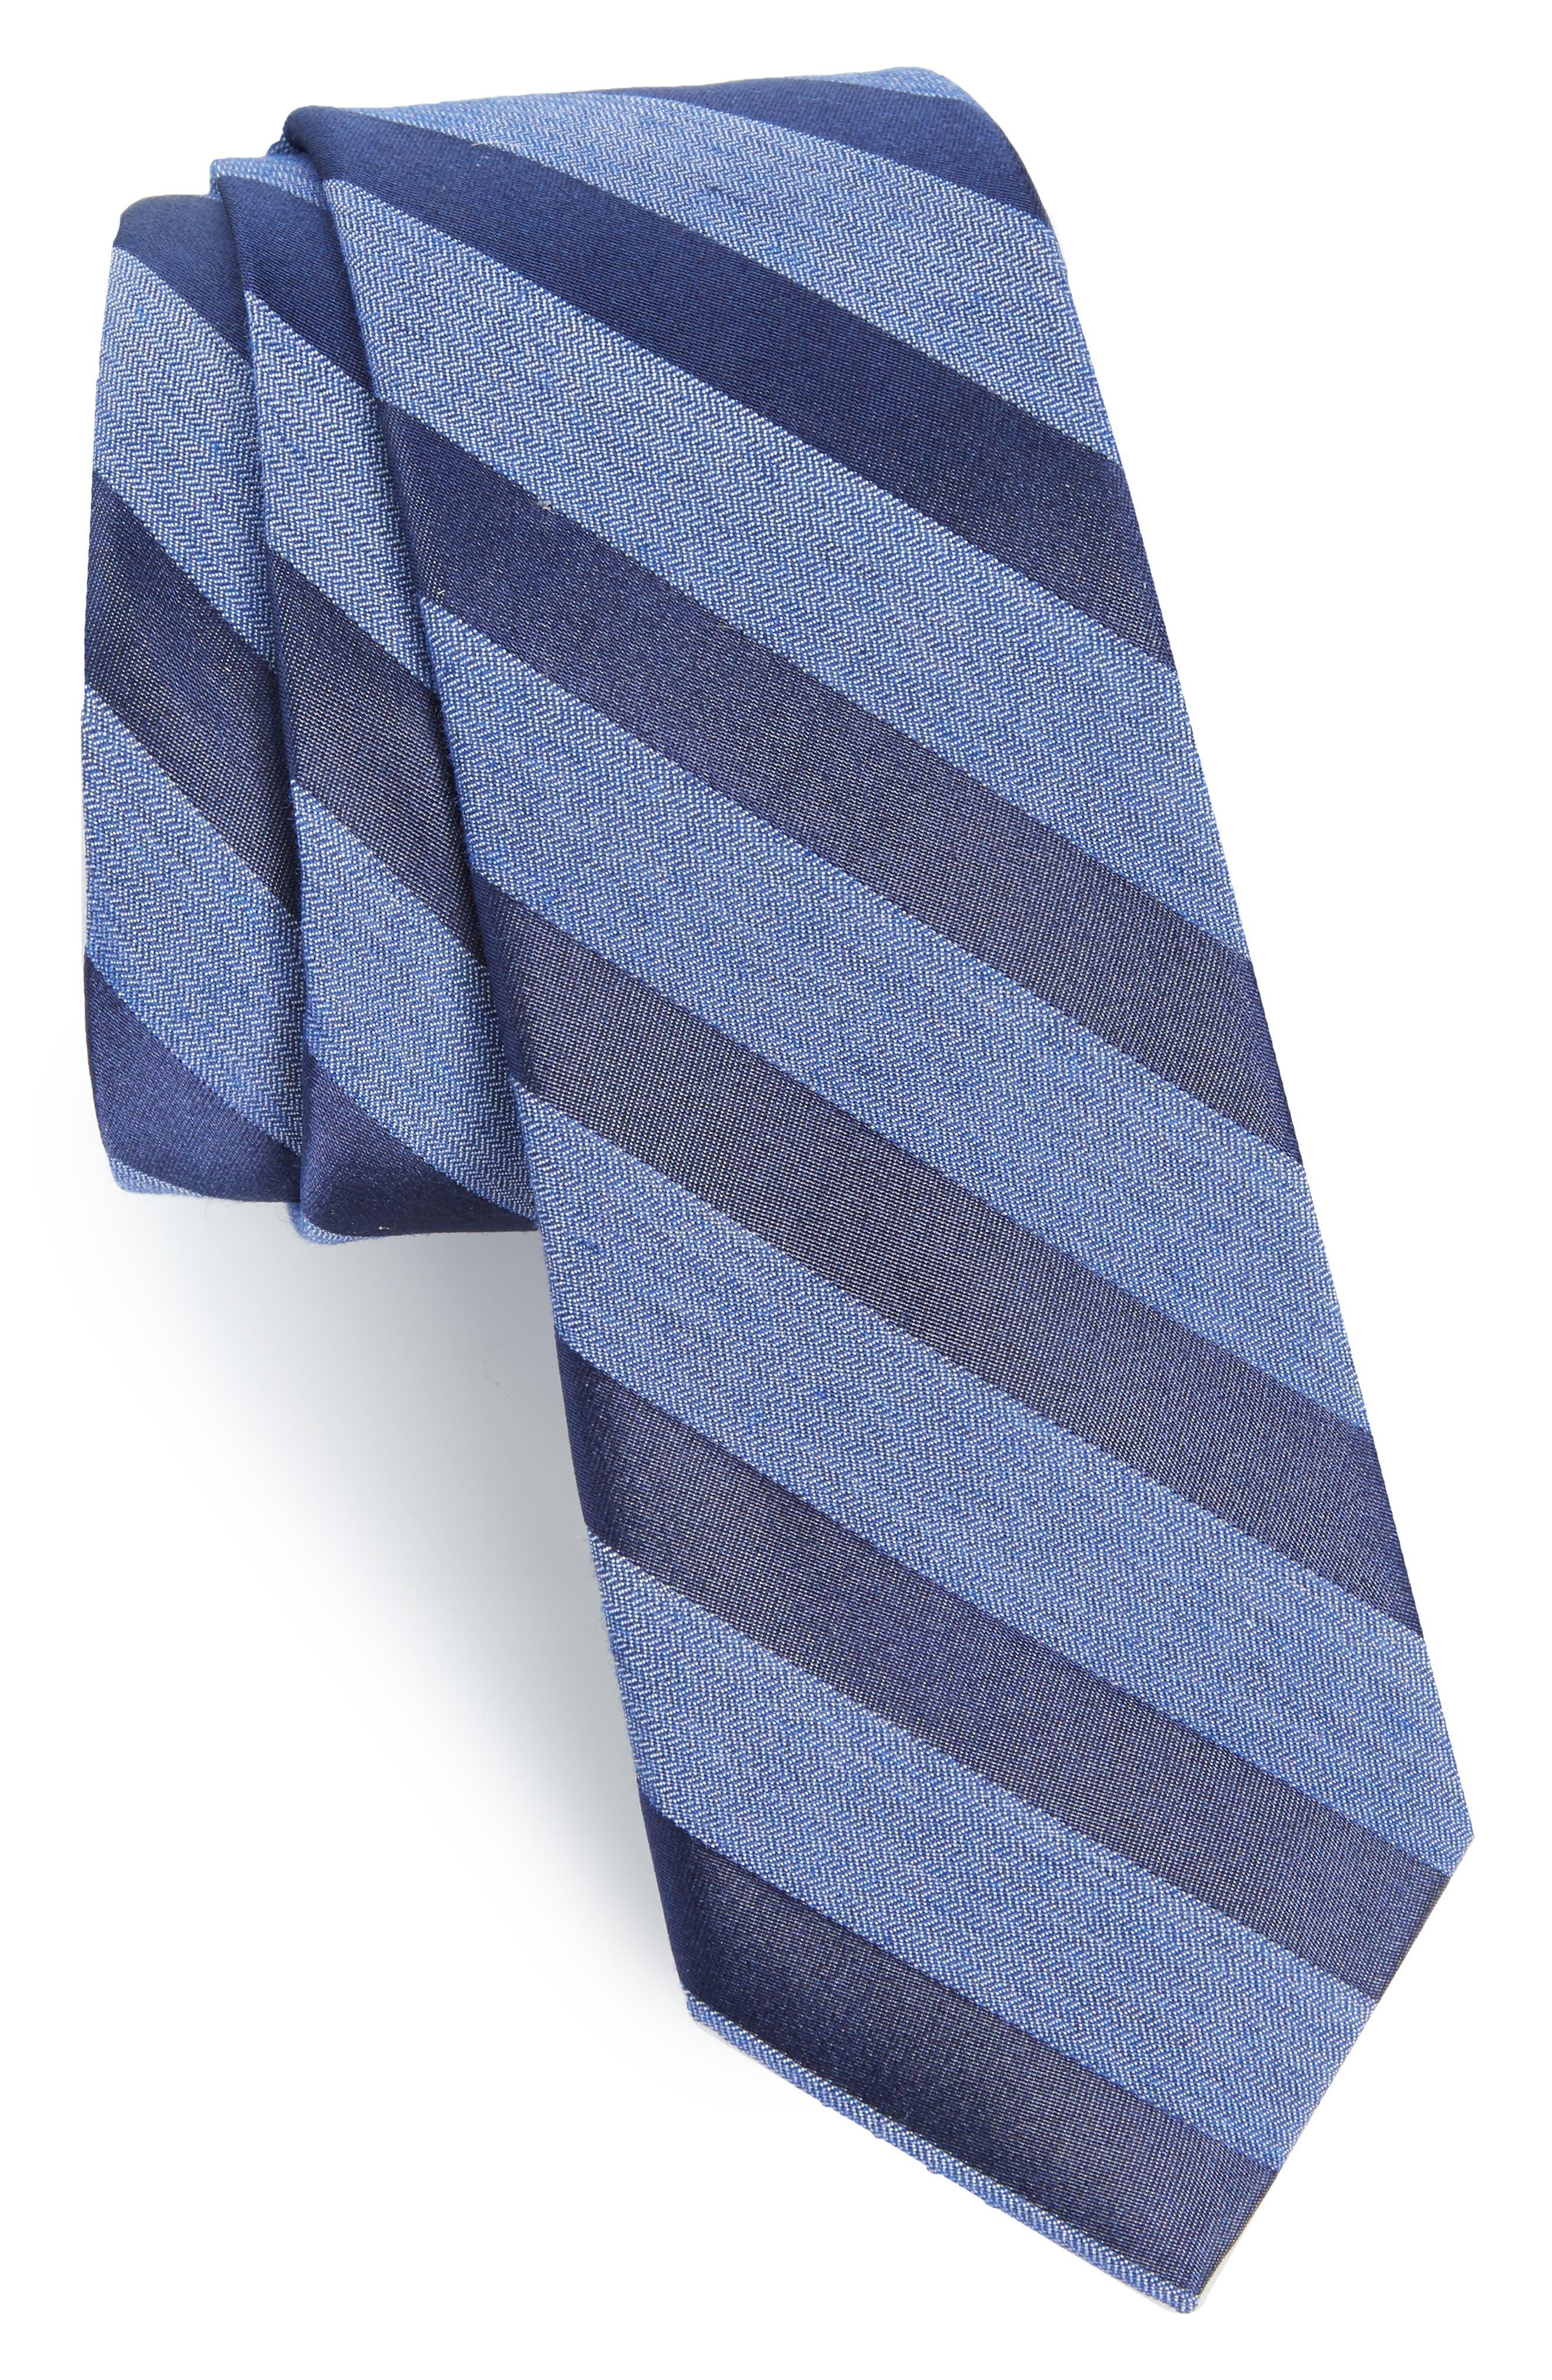 Bar Stripe Silk Blend Skinny Tie,                         Main,                         color, Navy